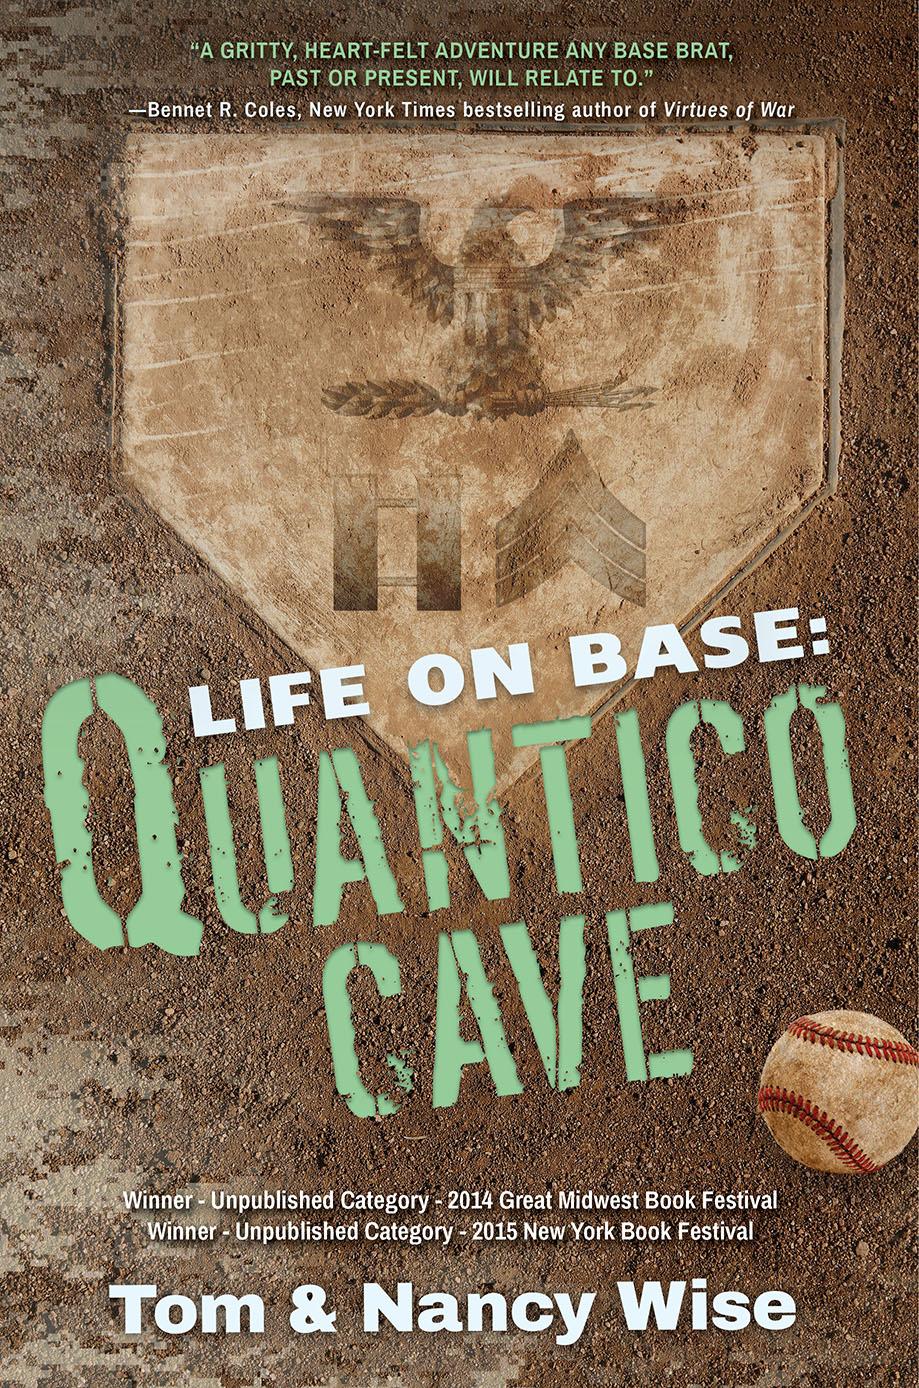 Life on Base Quantico Cave